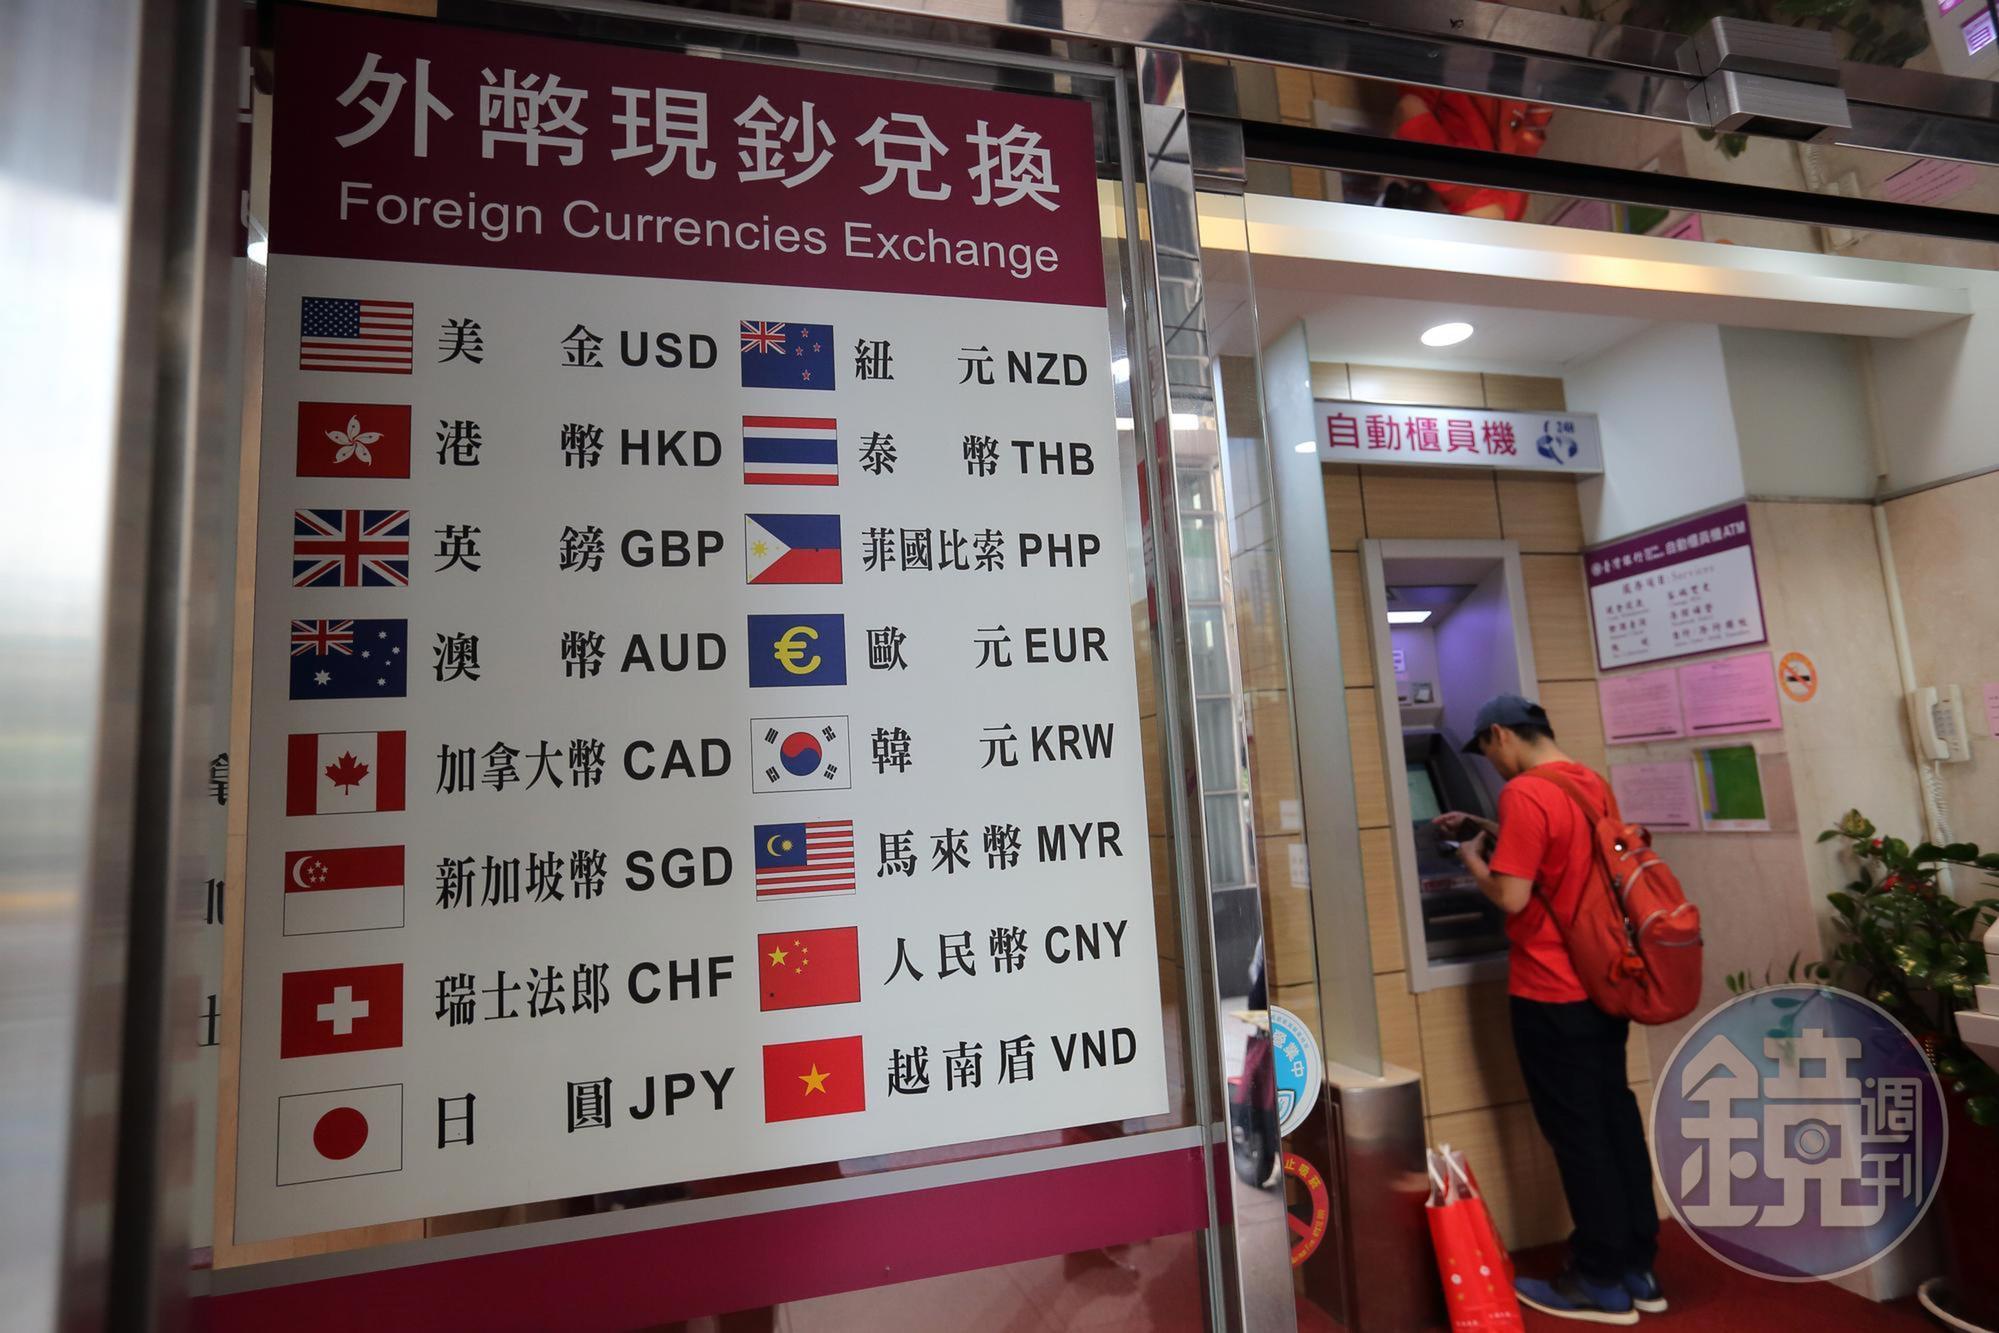 CFP國際認證高級理財規劃顧問吳家揚提醒,外幣投資,以美金為例,可設定在30~32元間賺價差。